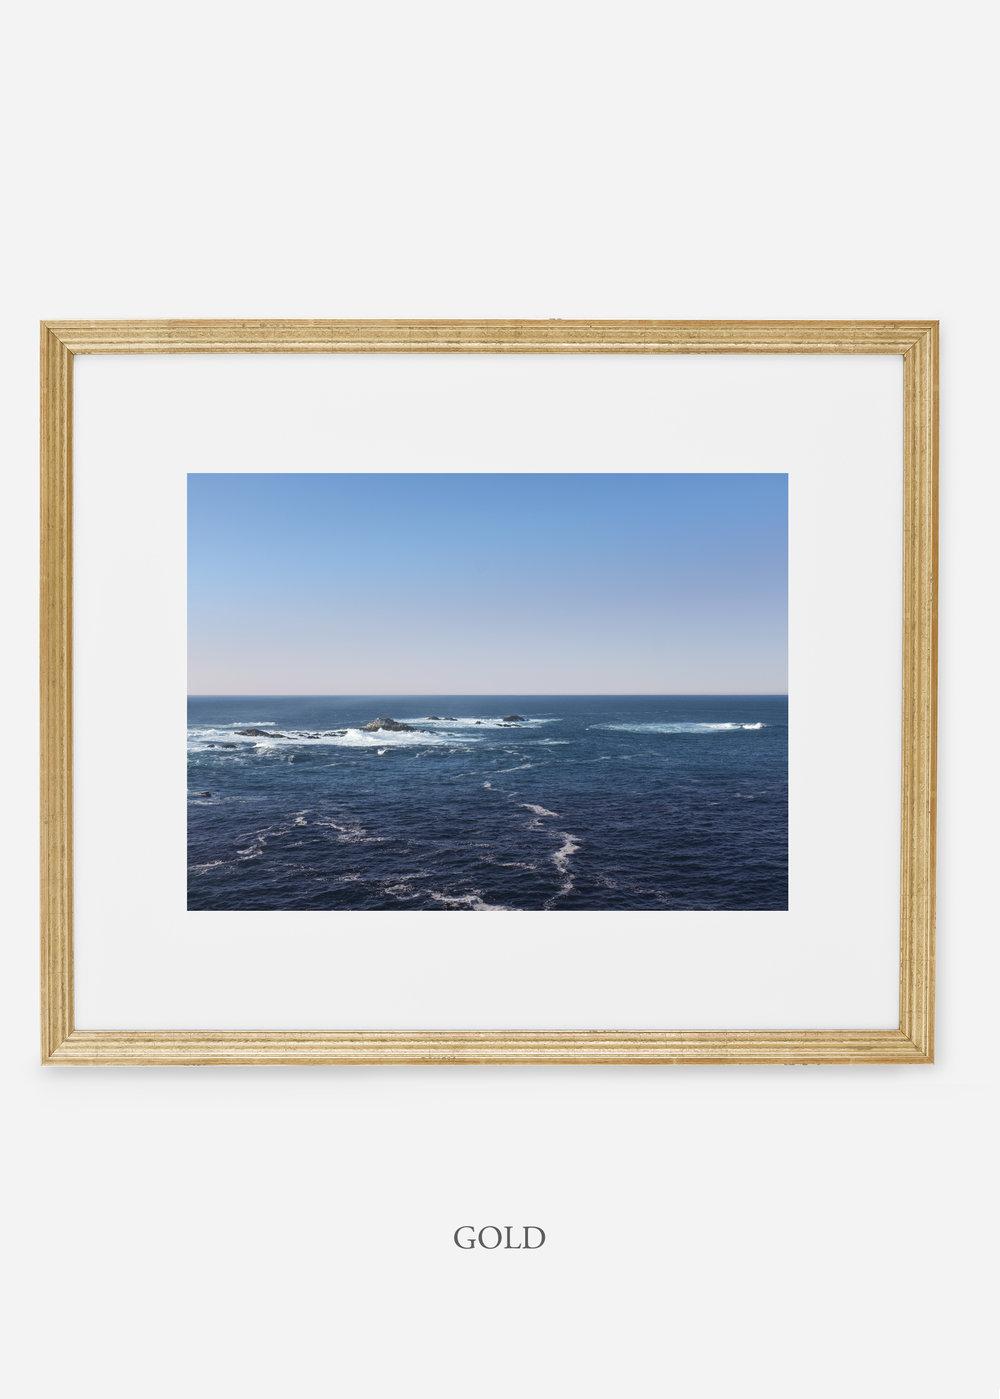 WilderCalifornia_goldframe_interiordesign_oceanprint_PacificOceanNo.1.jpg